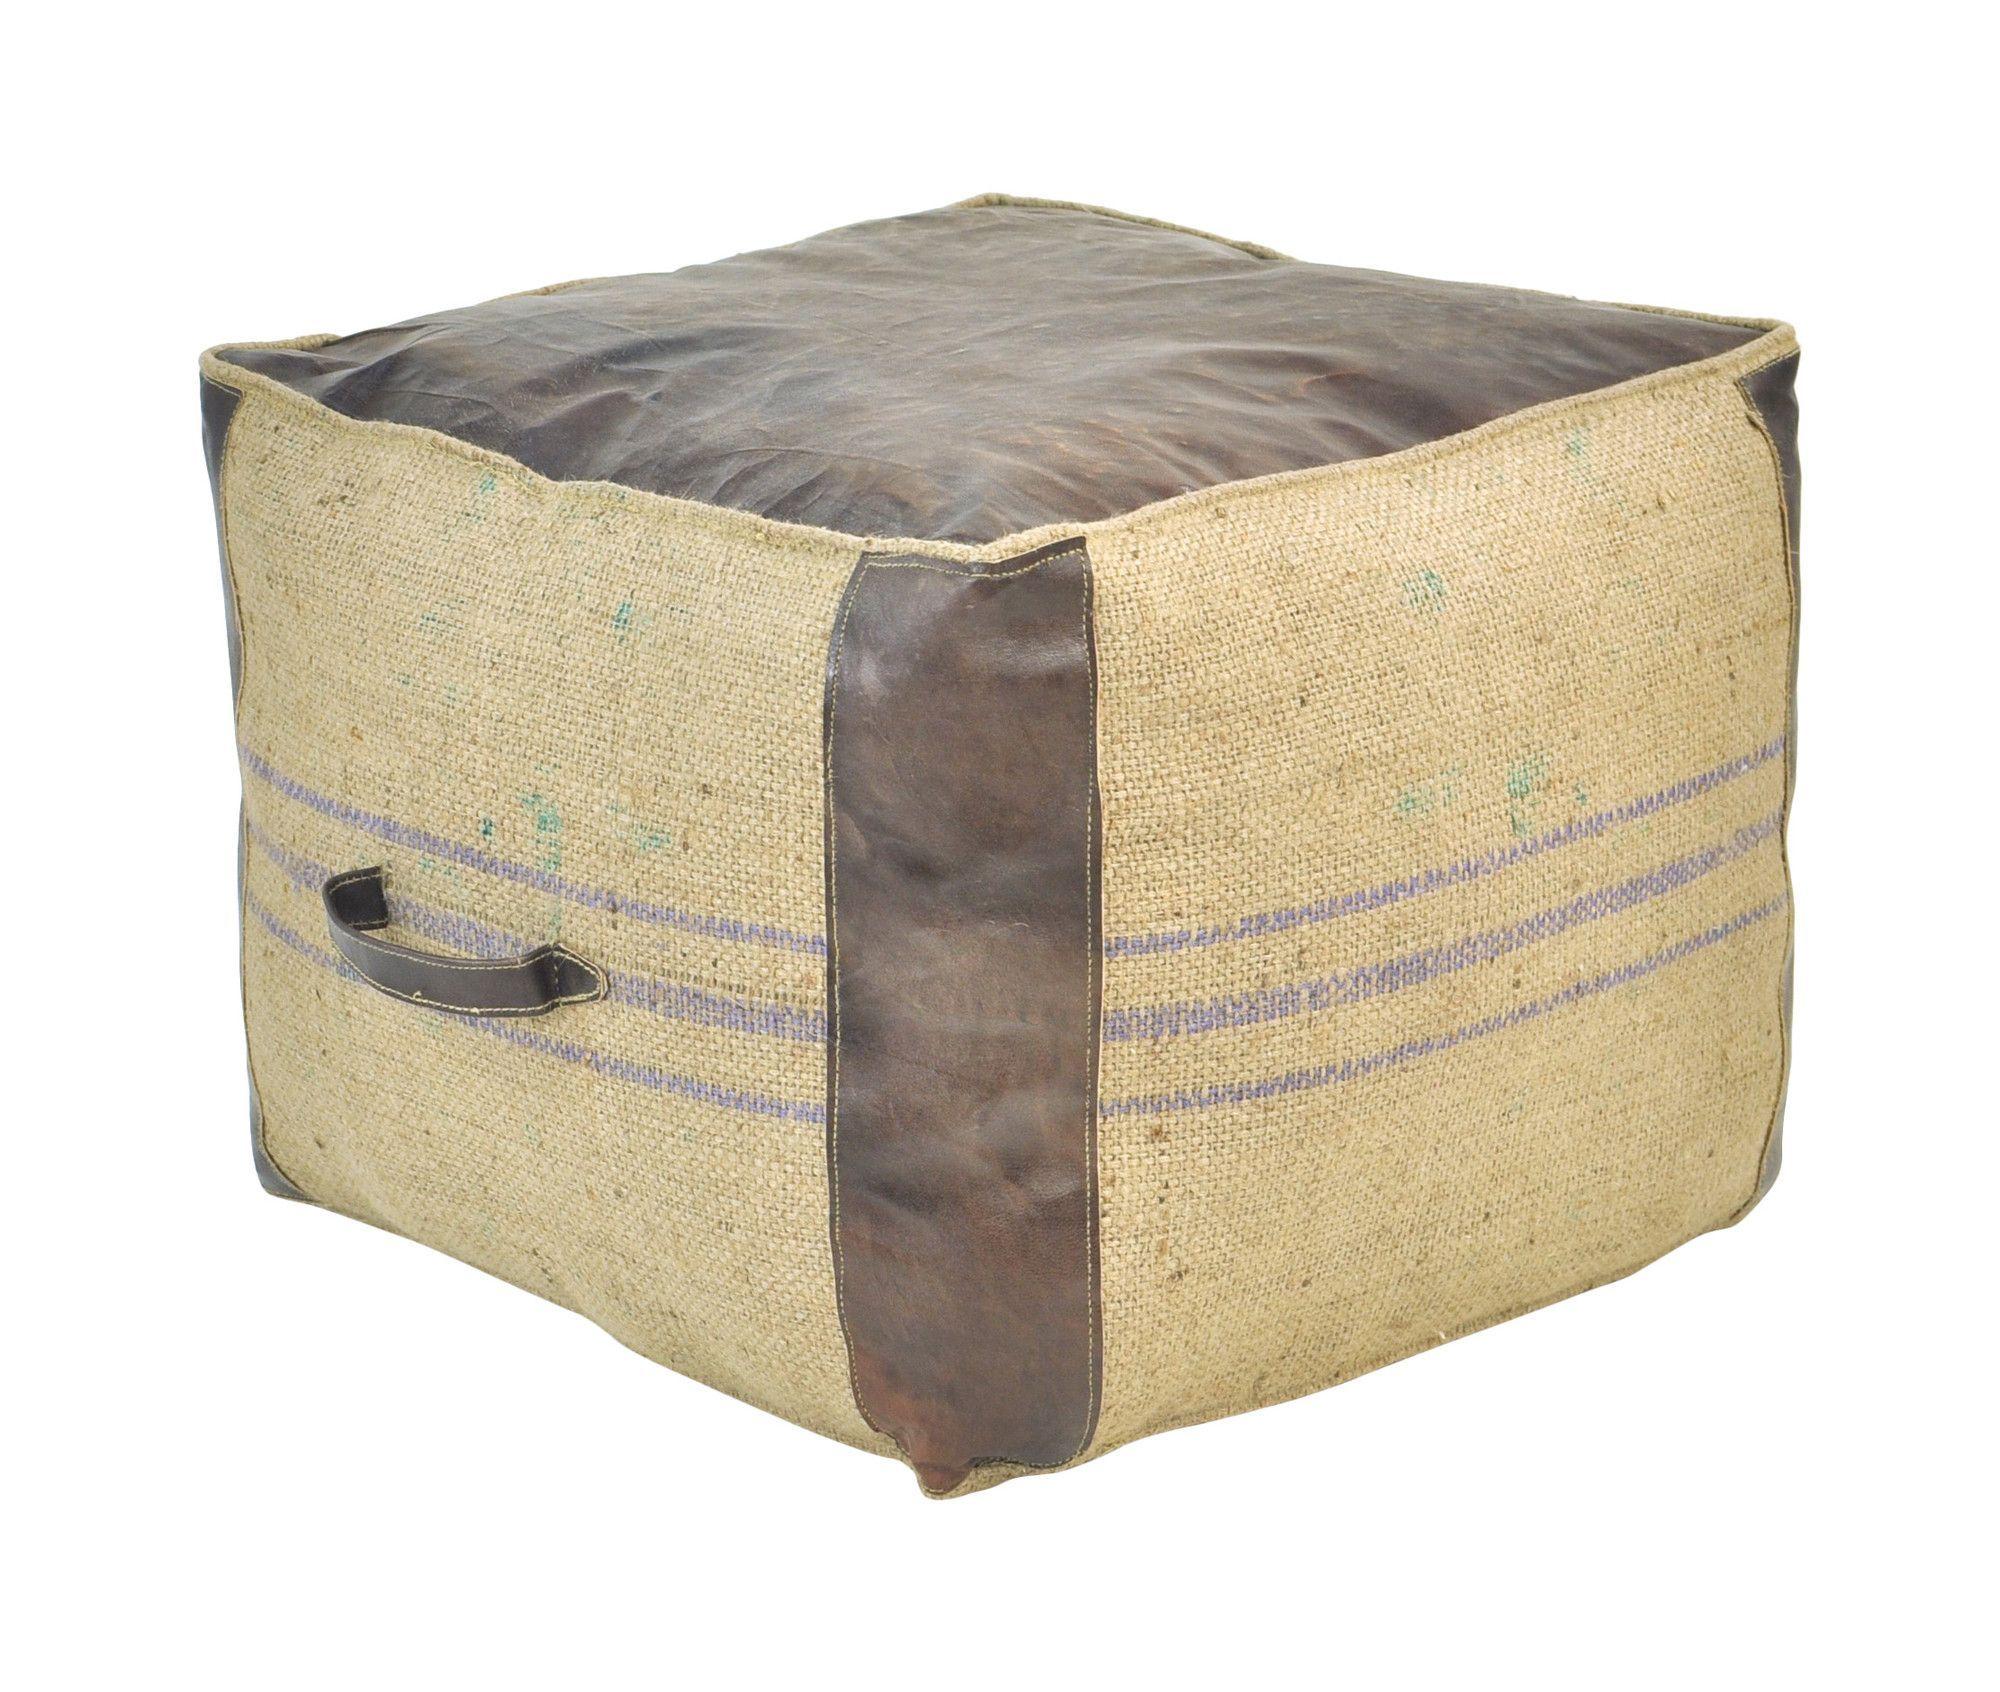 85 cube pouf tangier outdoor cube pouf pouffe. Black Bedroom Furniture Sets. Home Design Ideas